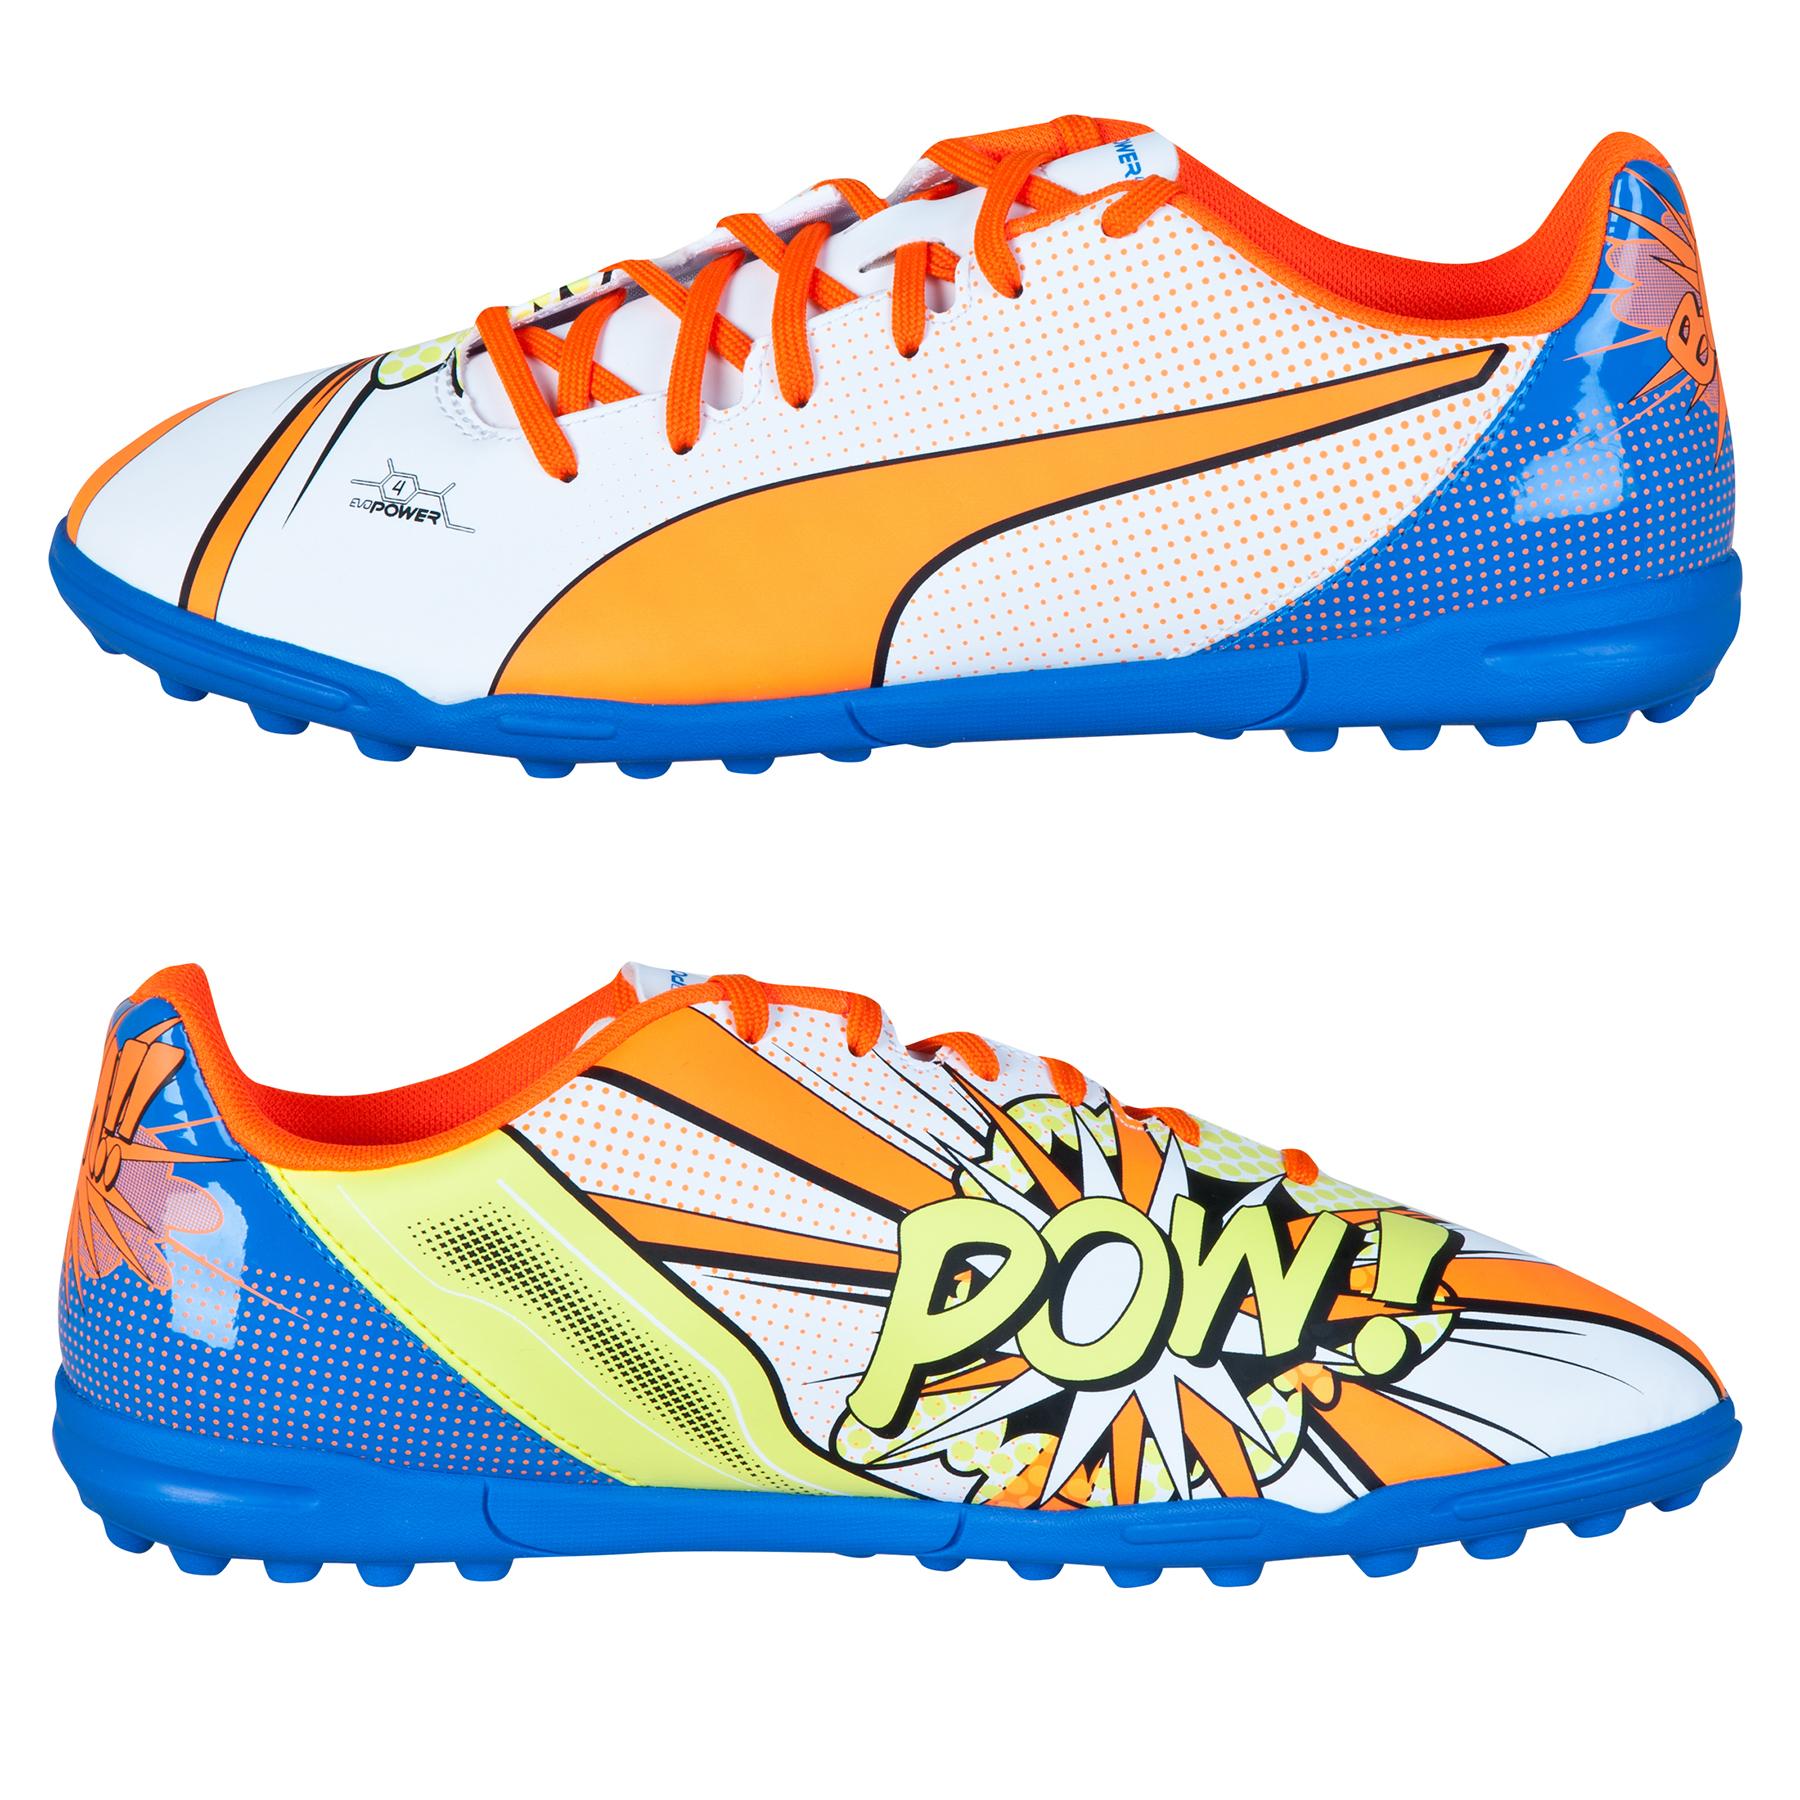 Puma evoPOWER 4.2 POP Astroturf Trainers White